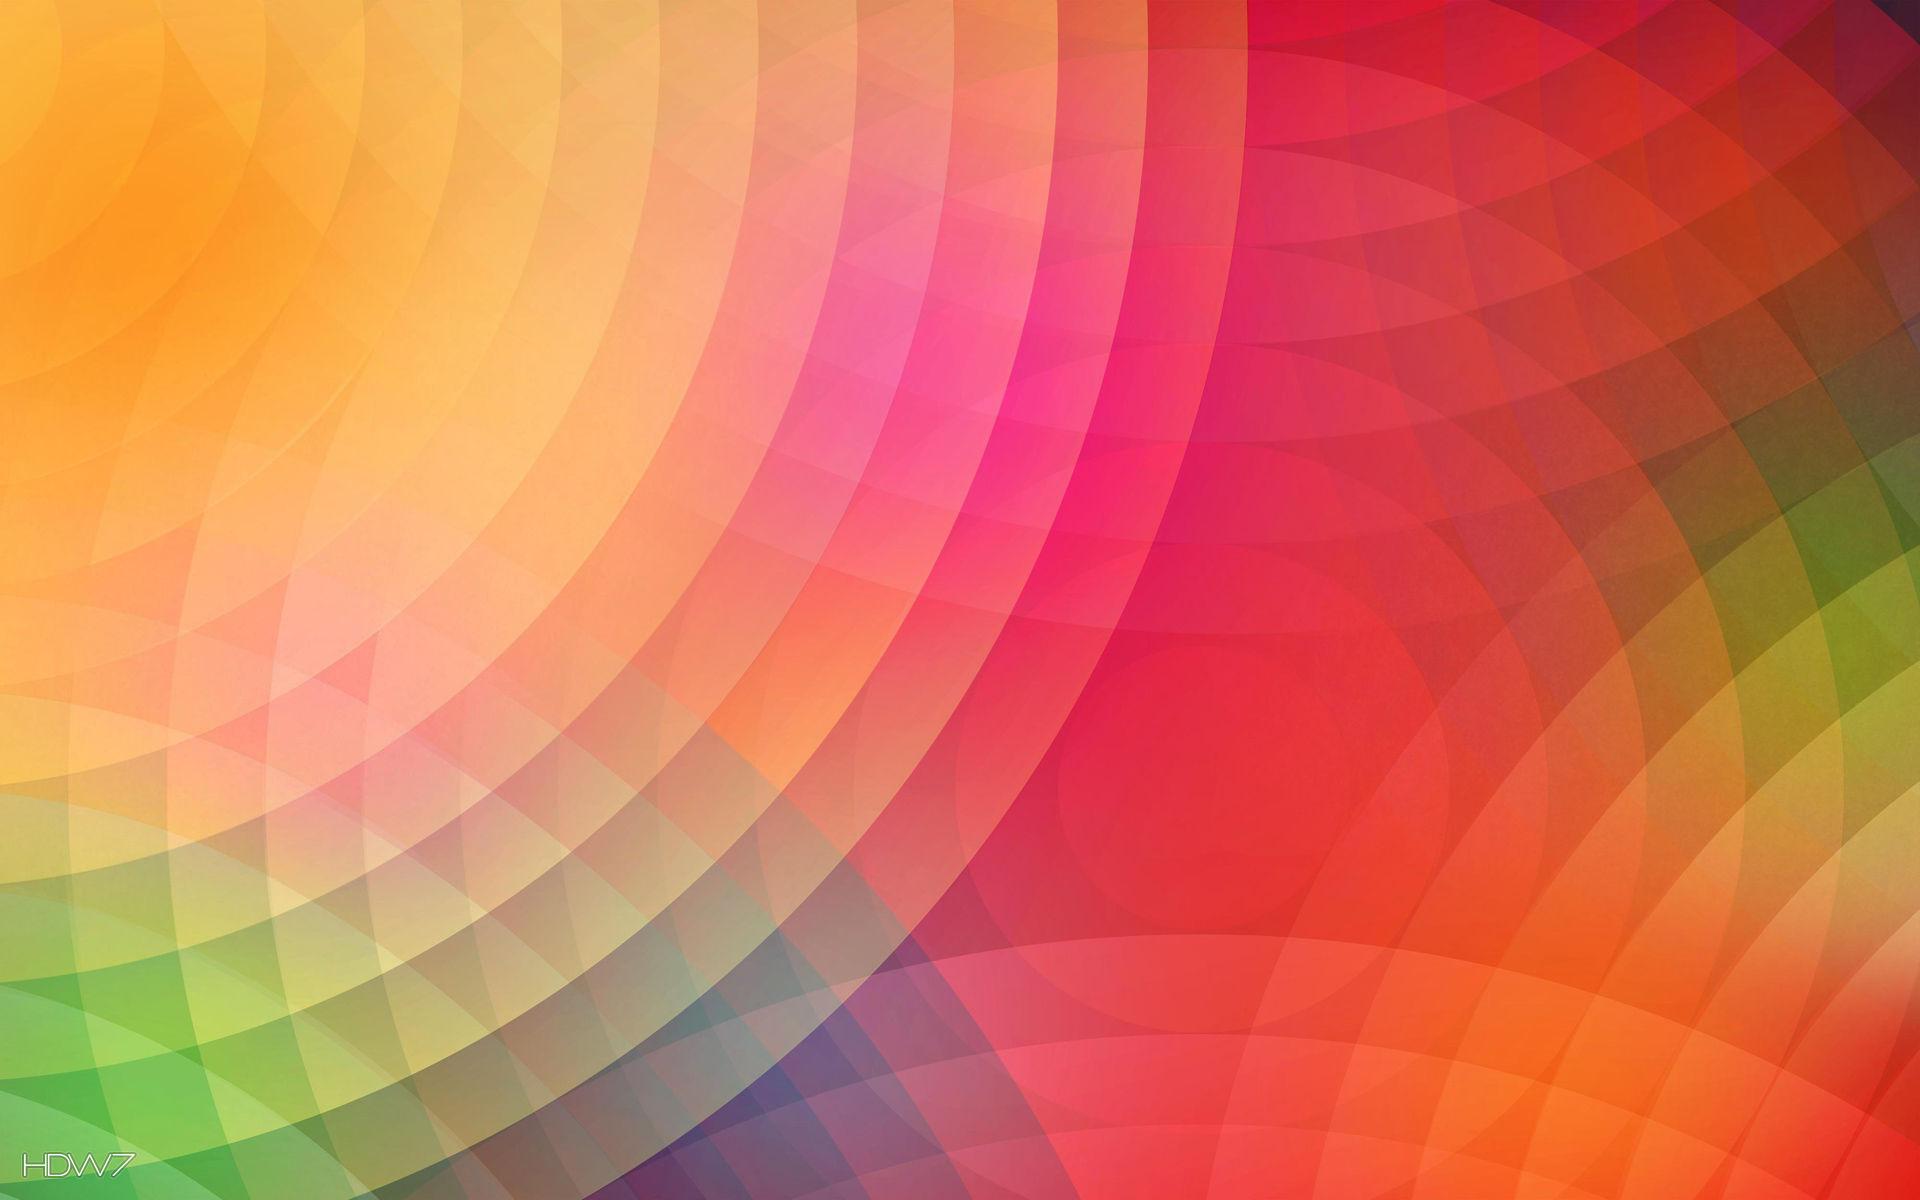 nexus abstract wallpaper HD wallpaper gallery 12 1920x1200